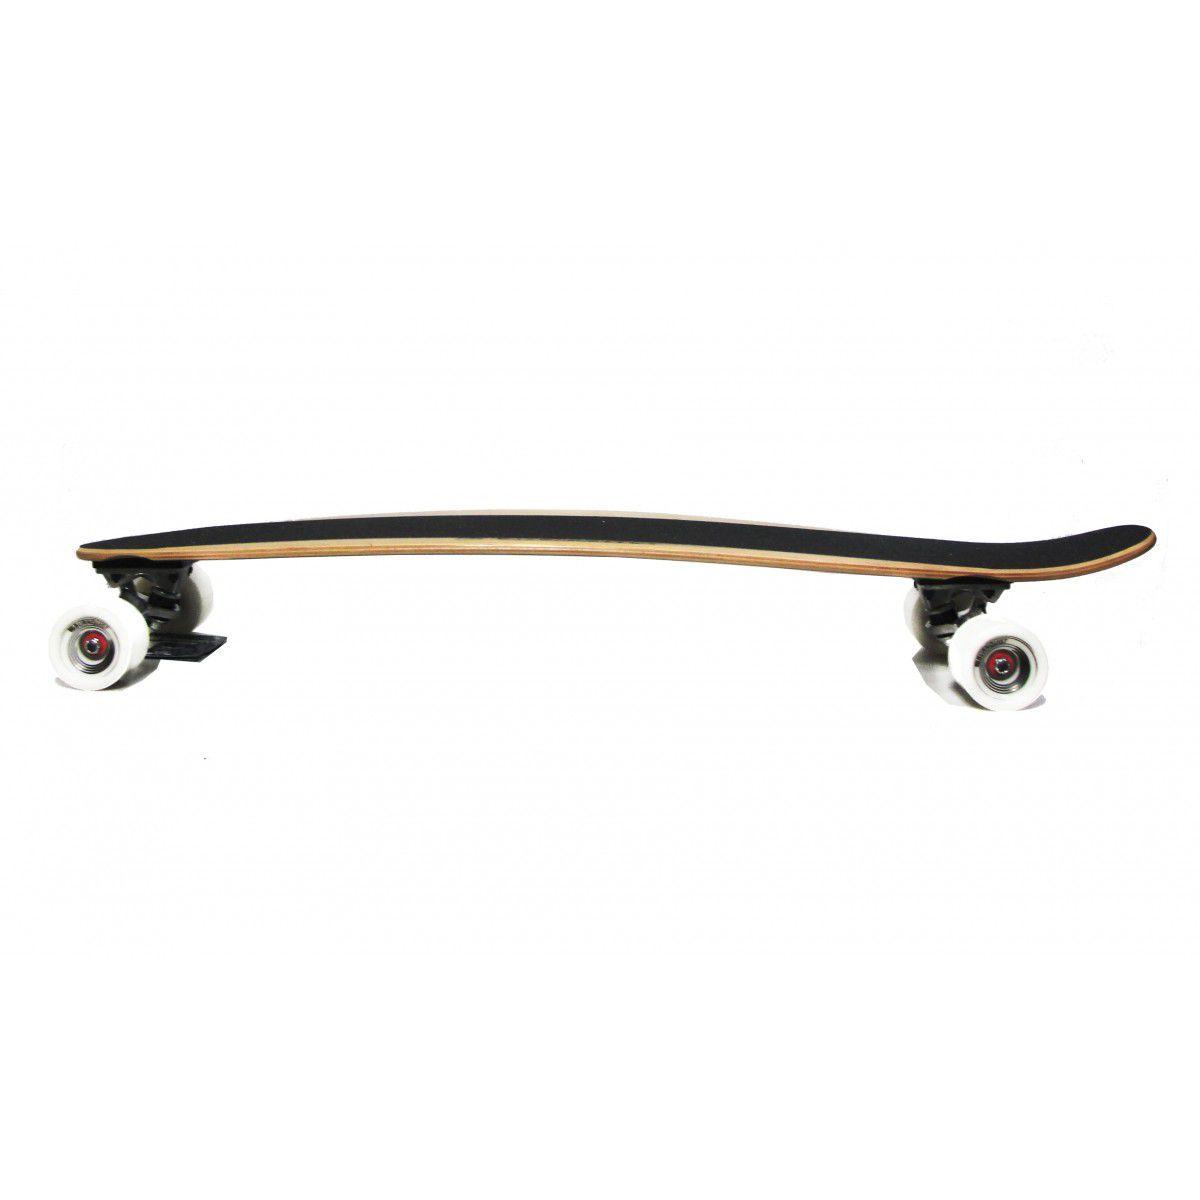 Longboard Profissional Pintall Cruising + Kit Proteçao Brinde  Bob Burnquist Skate - Multilaser